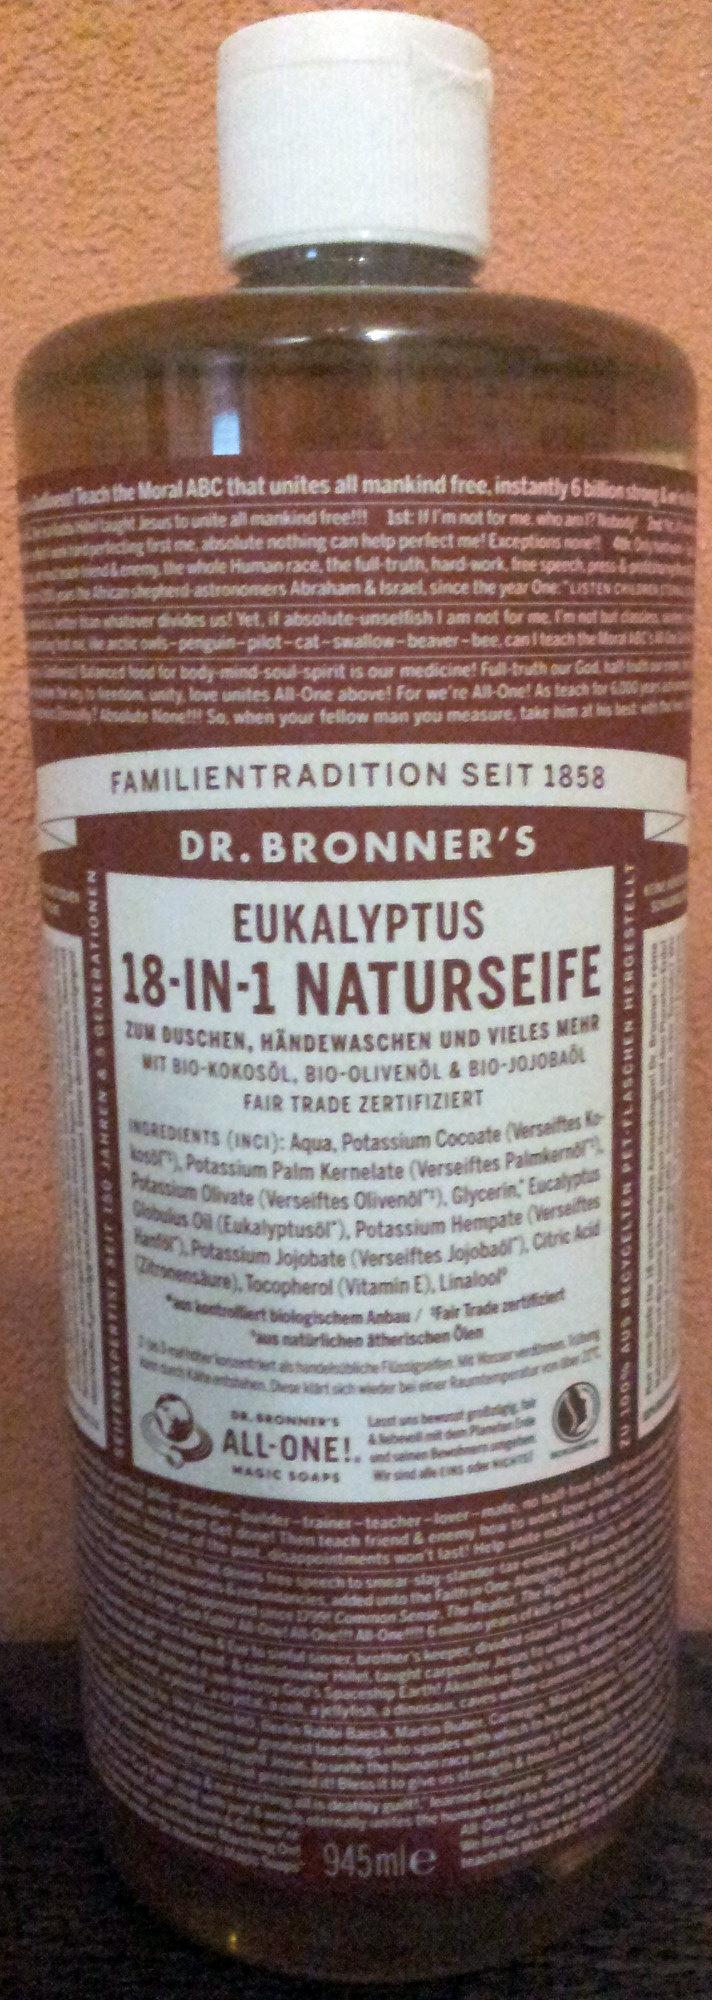 Dr. Bronner's 18-IN-1 Naturseife Eukalyptus - Product